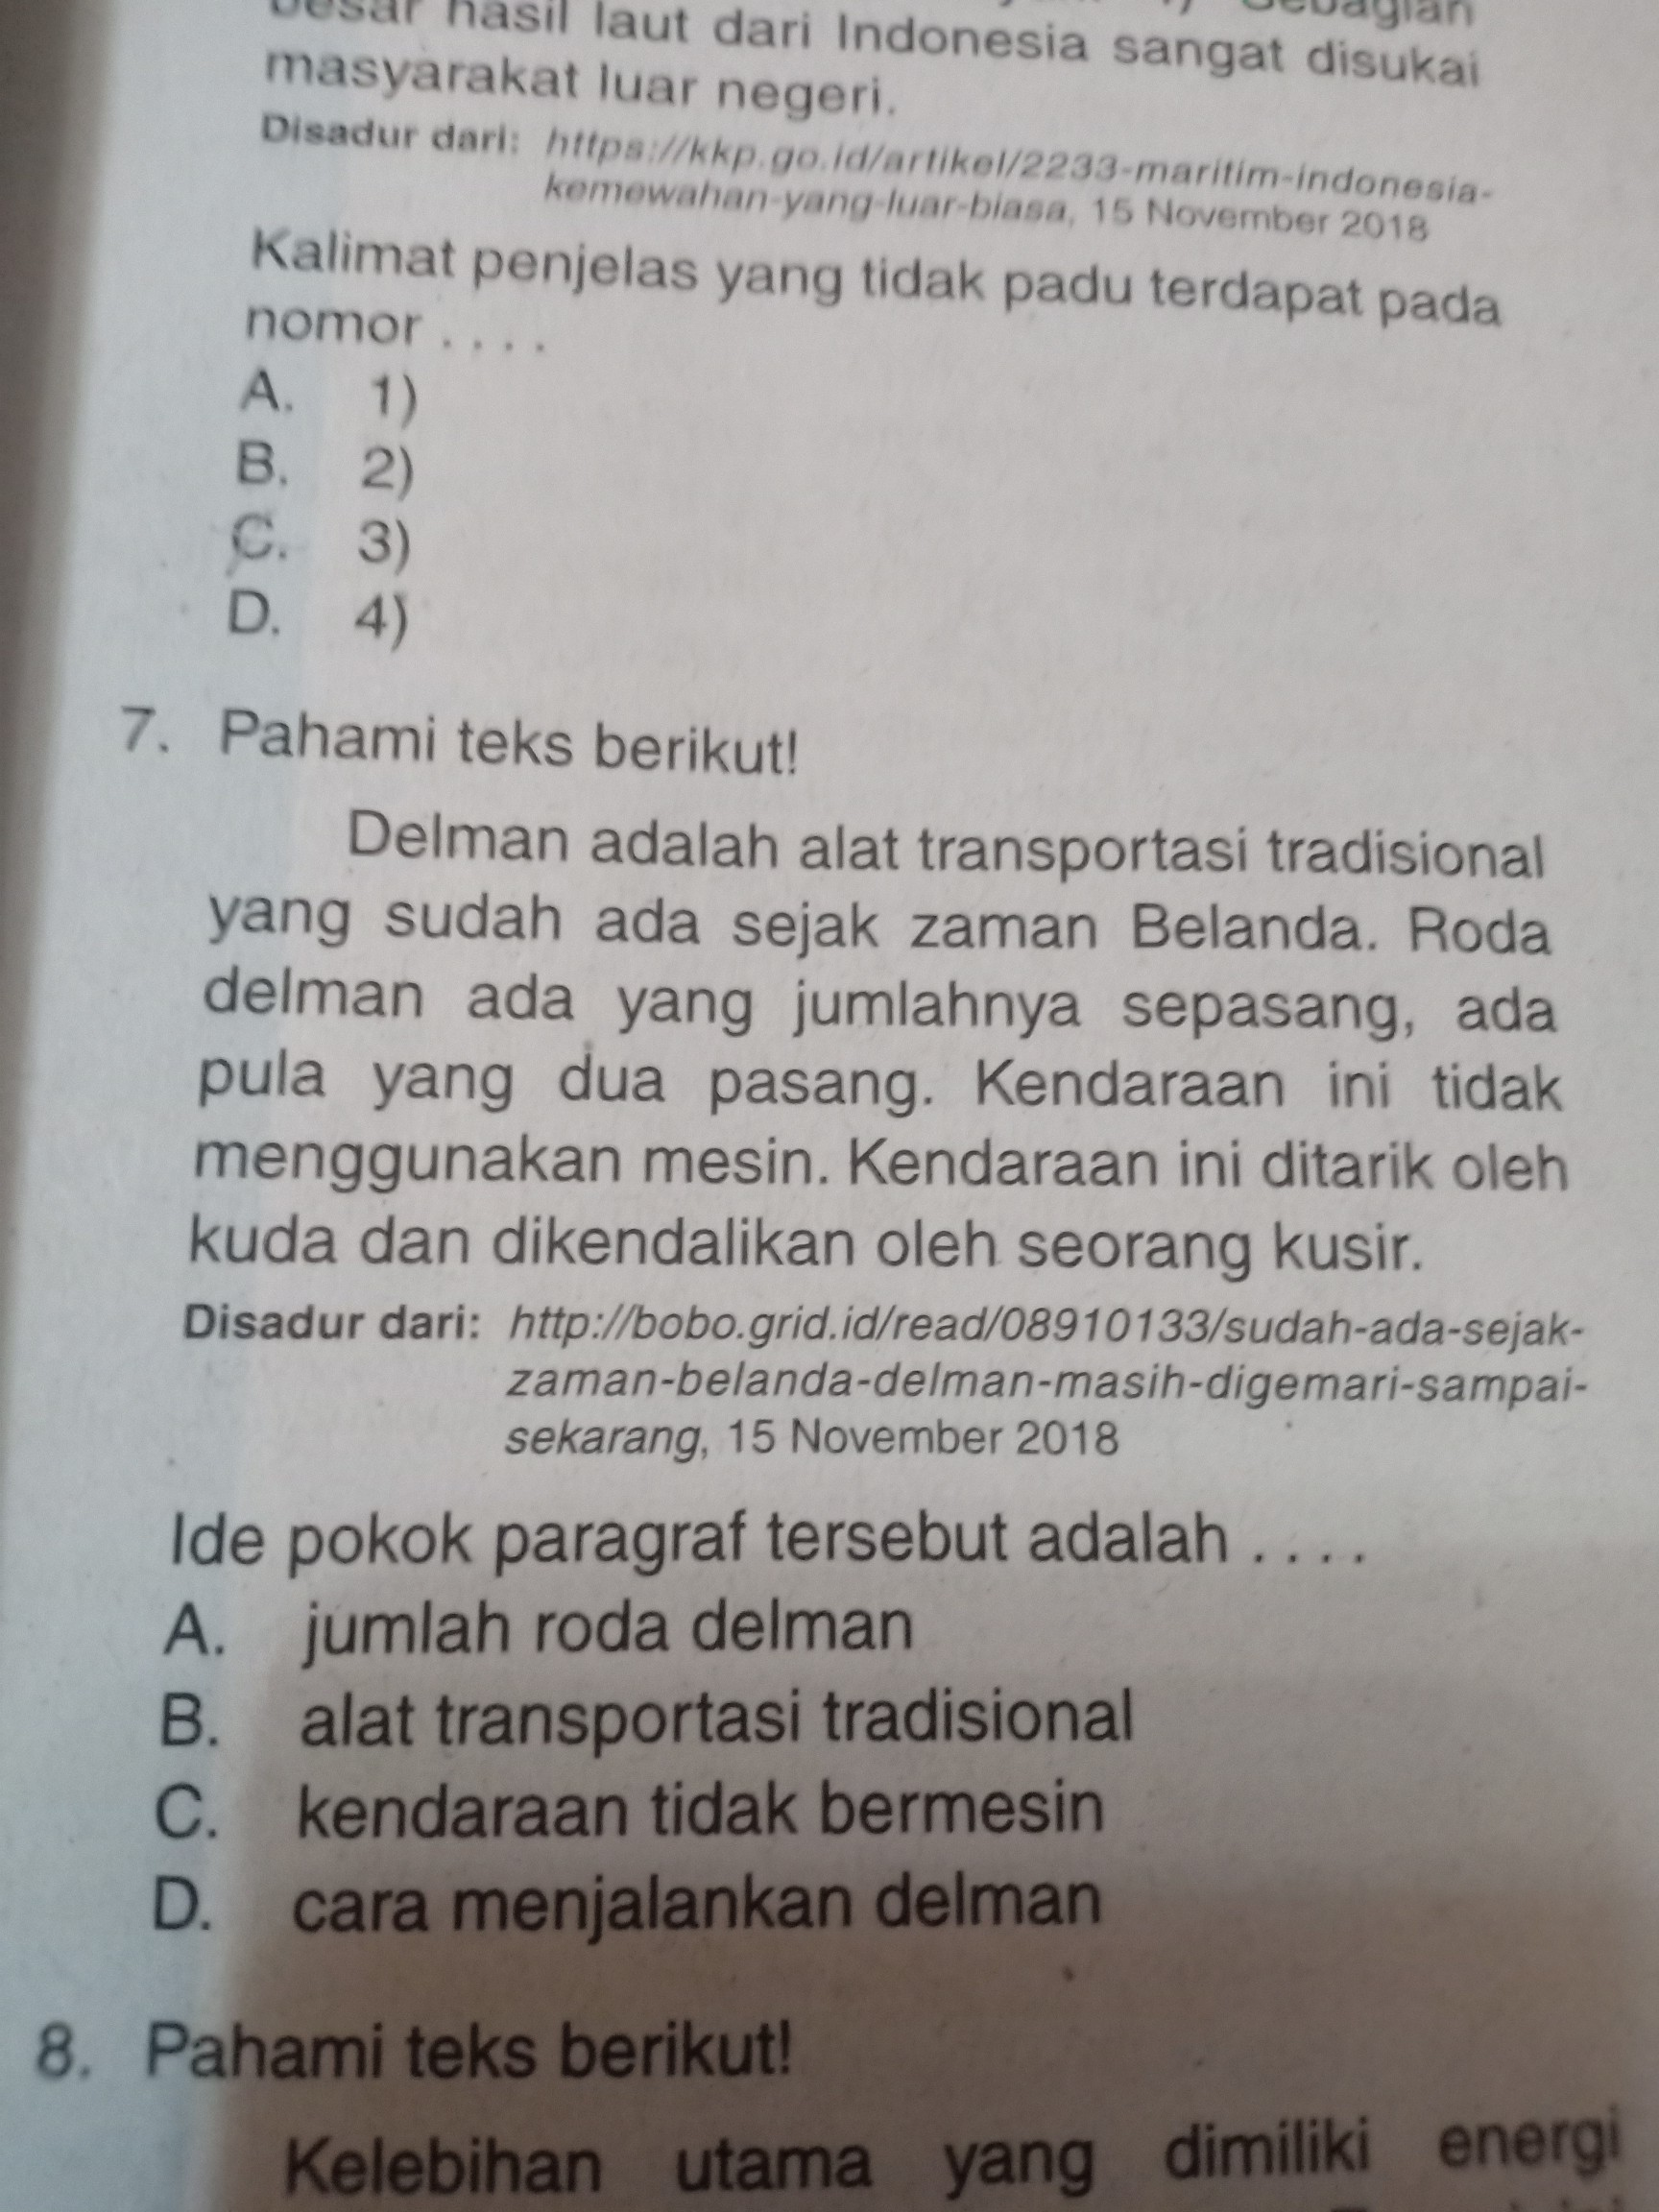 Ide Pokok Paragraf Tersebut : pokok, paragraf, tersebut, Pokok, Paragraf, Tersebut, Adalah, Brainly.co.id